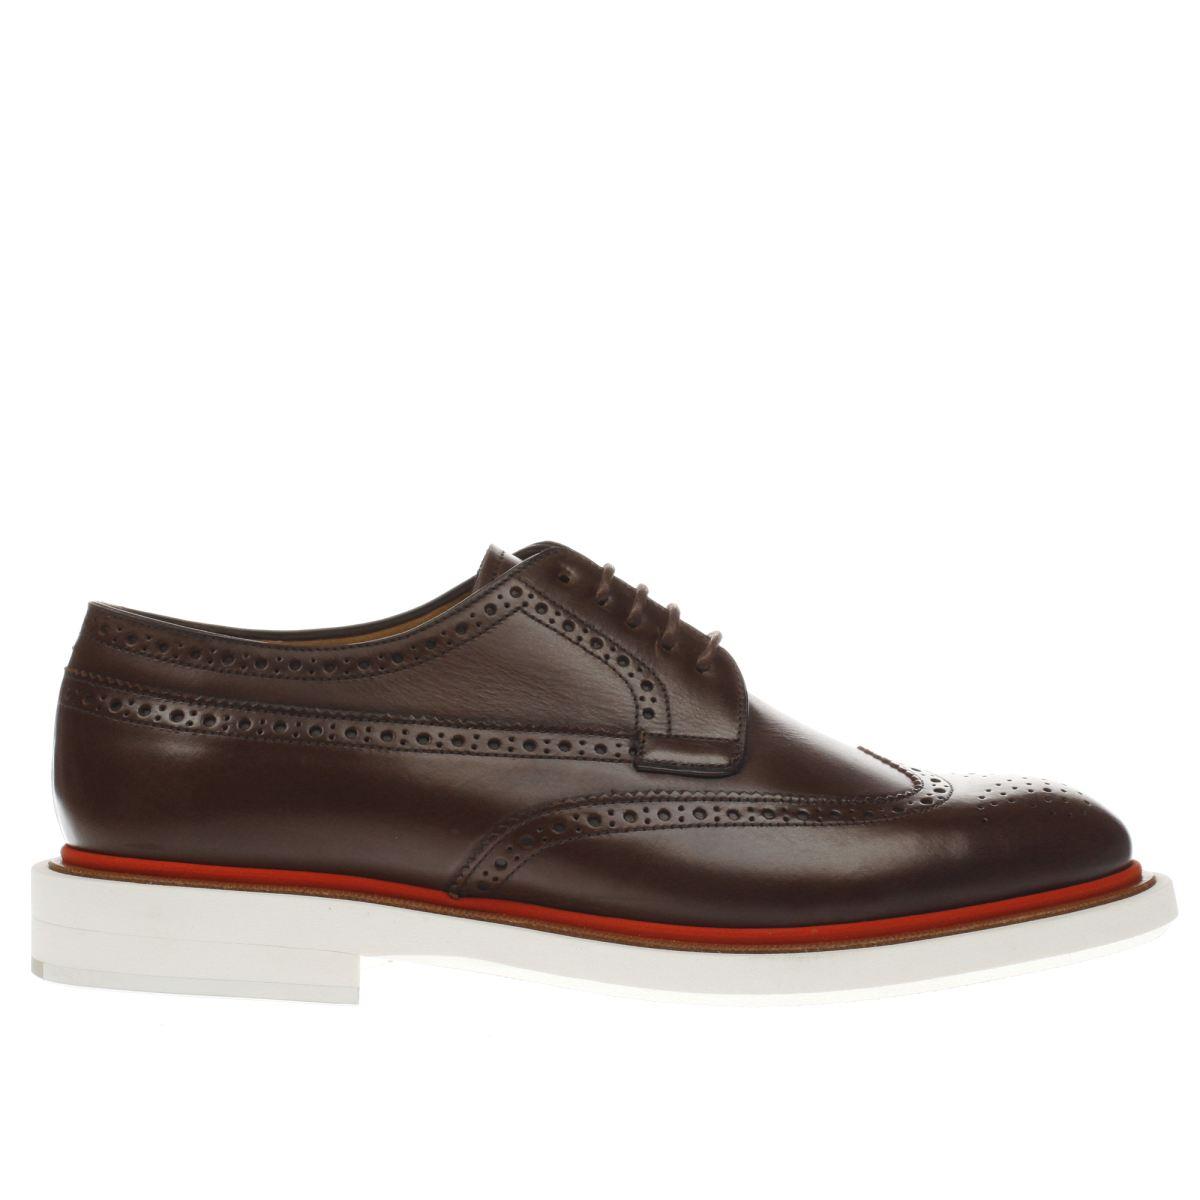 paul smith shoe ps Paul Smith Shoe Ps Dark Brown Junior Shoes